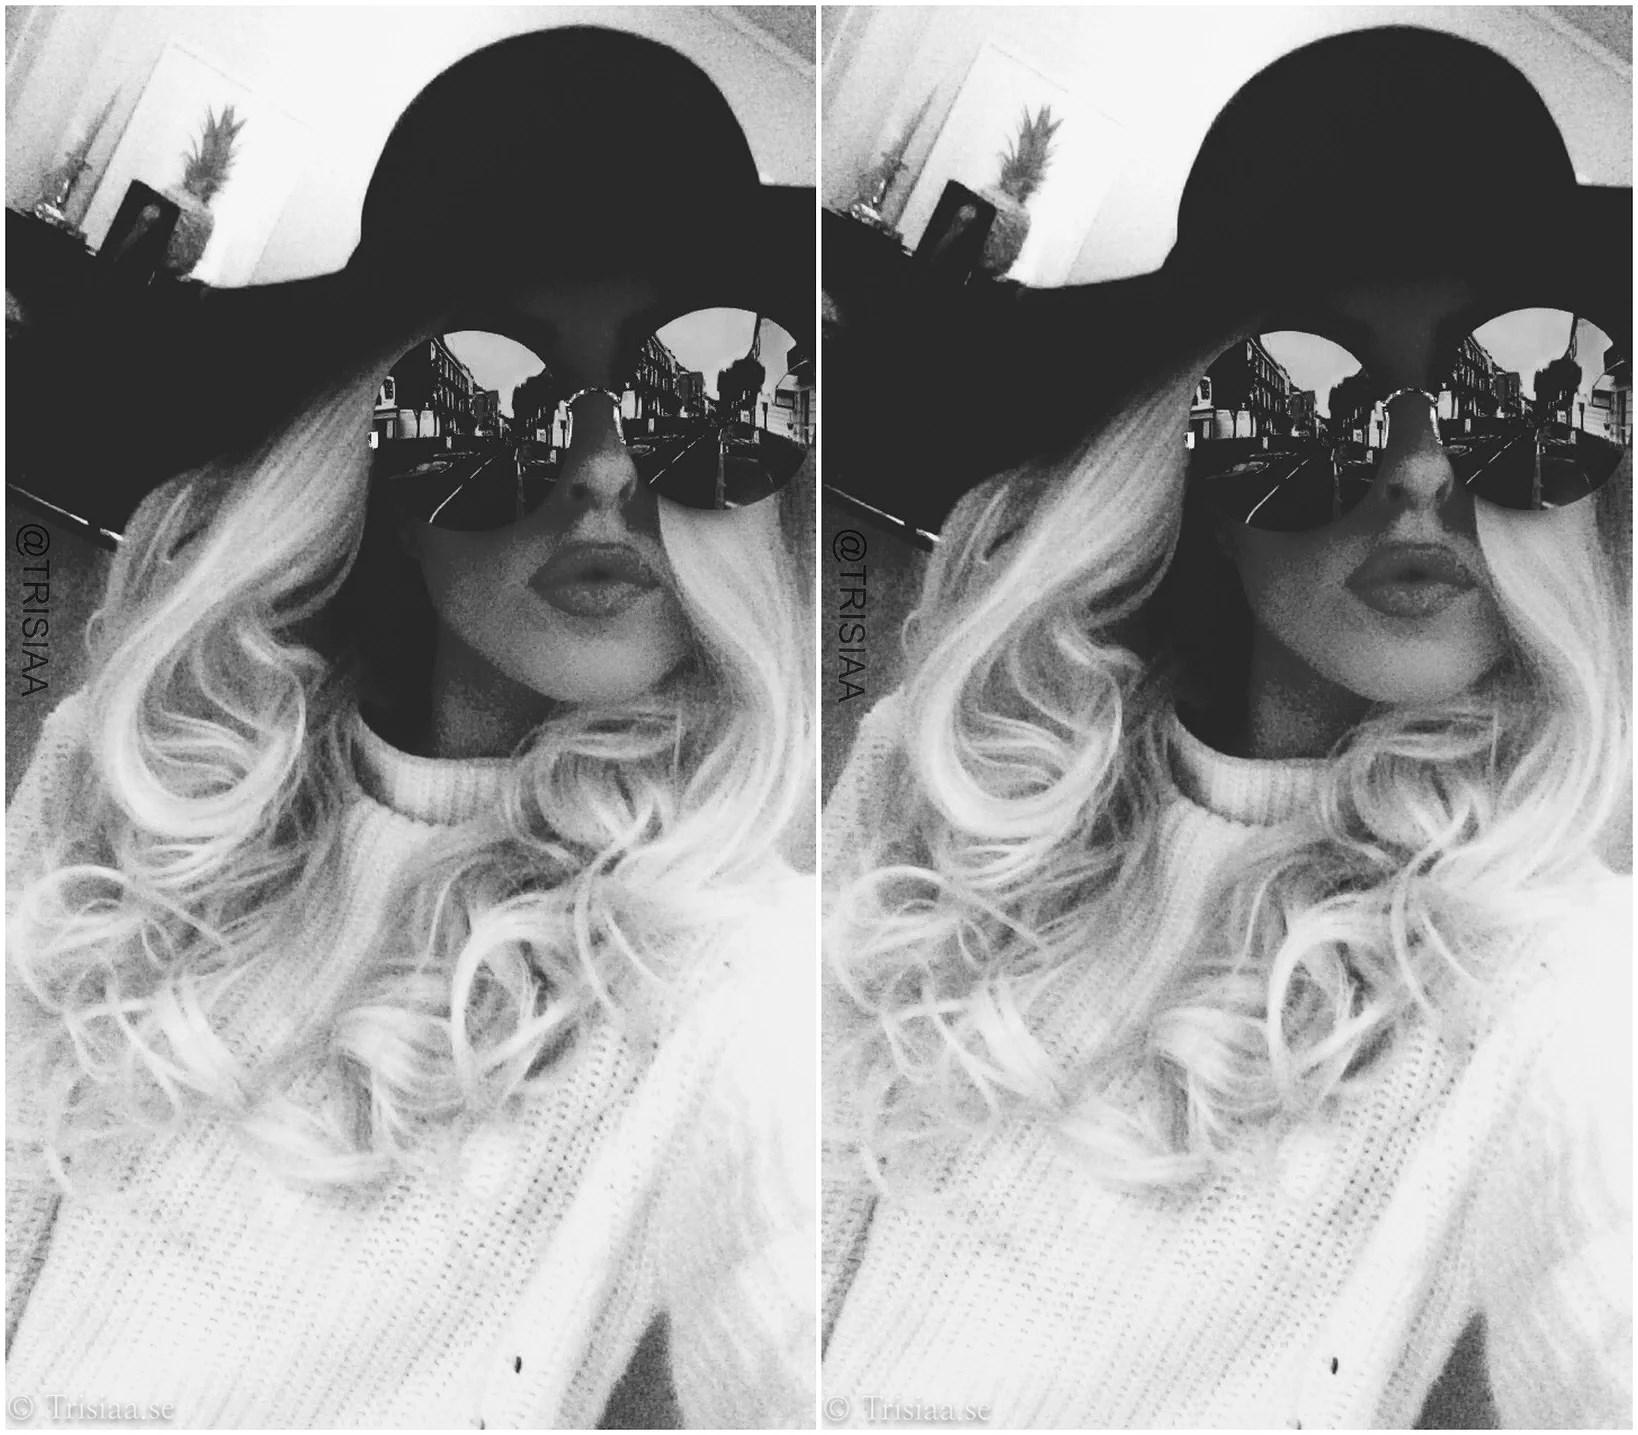 Blondie - A selfie from yesterday.